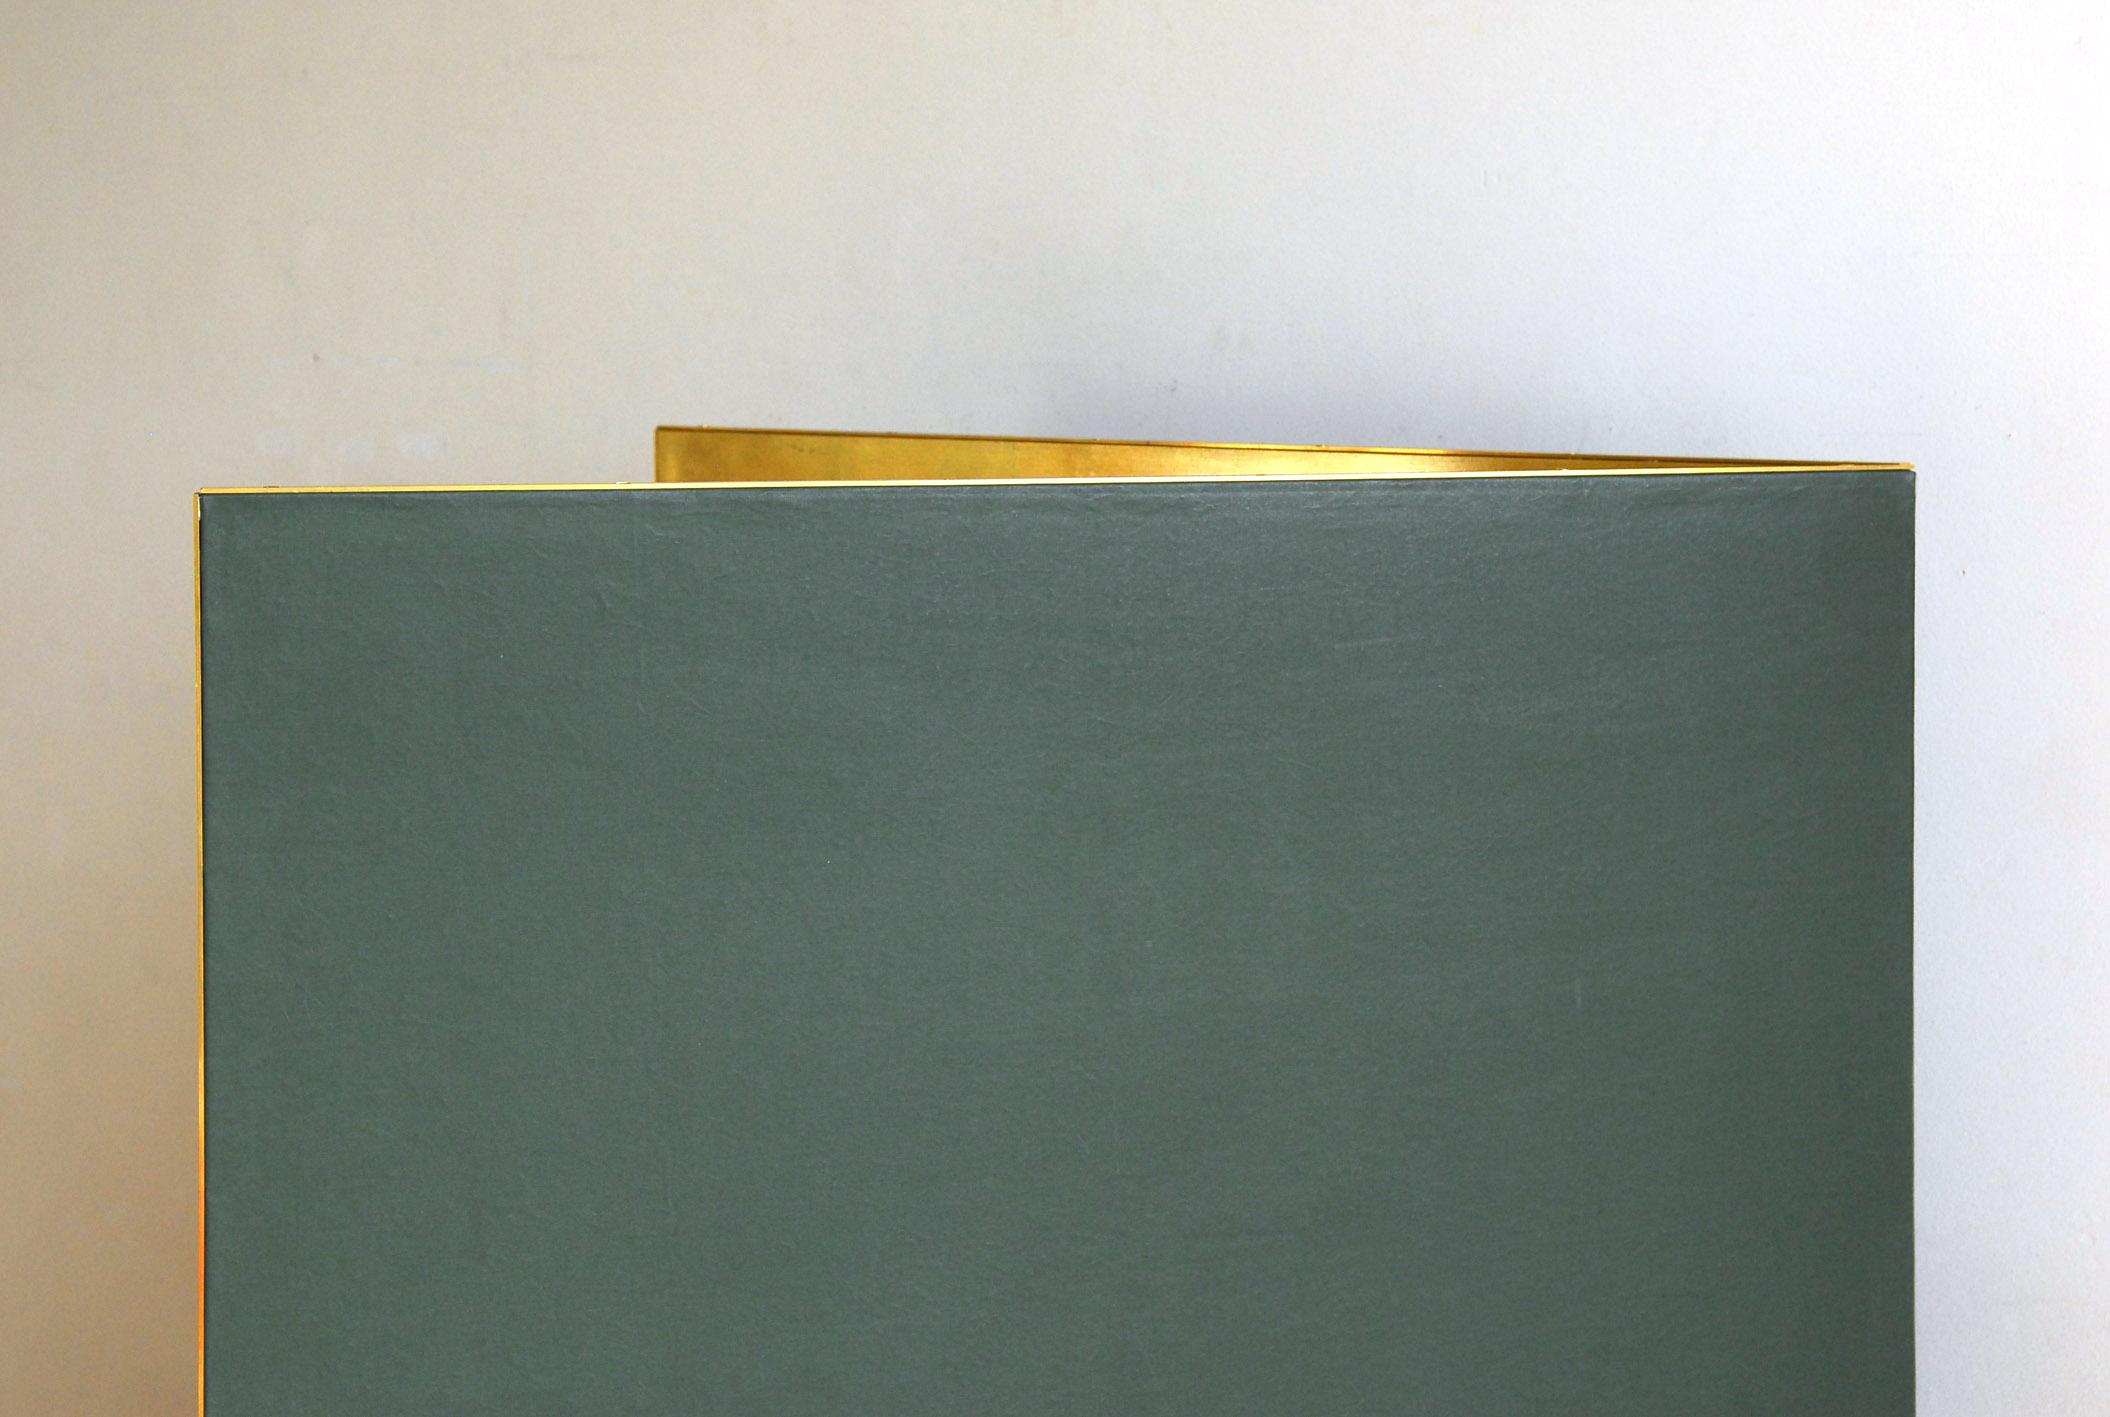 paravento verde 1.jpg